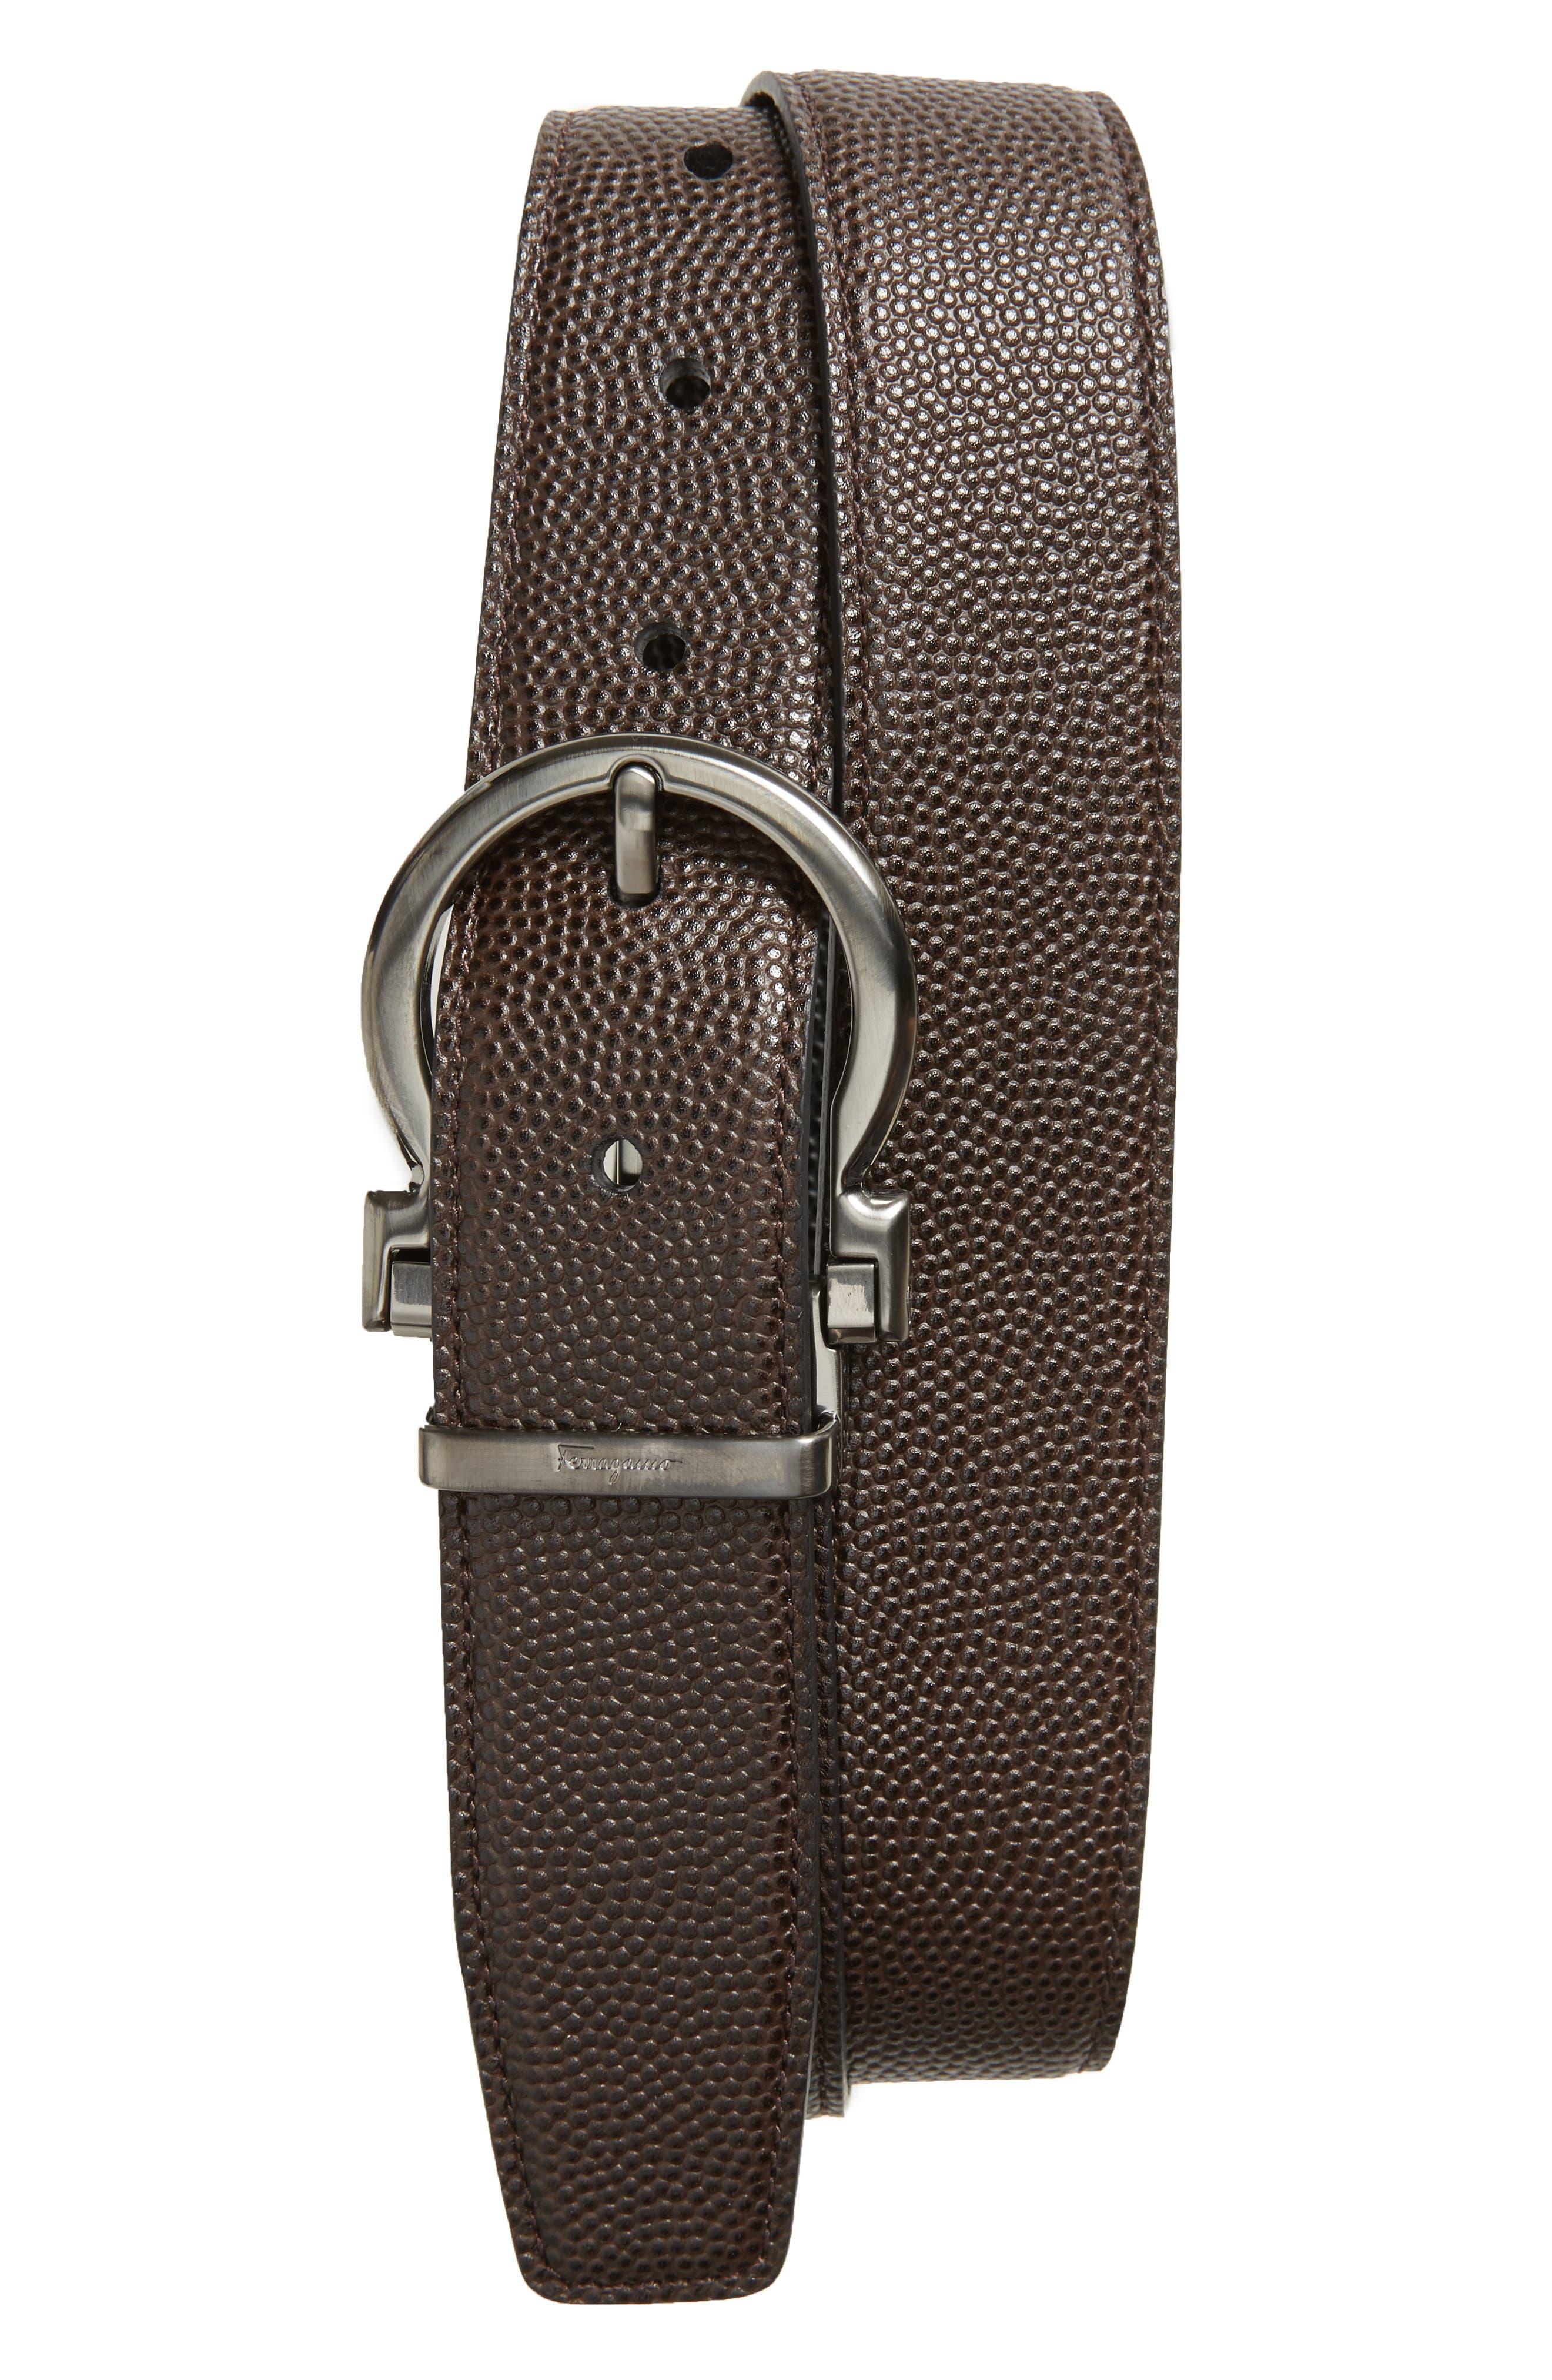 SALVATORE FERRAGAMO Salvatore Ferragaom Reversible Leather Belt, Main, color, CHOCOLATE/ BLACK